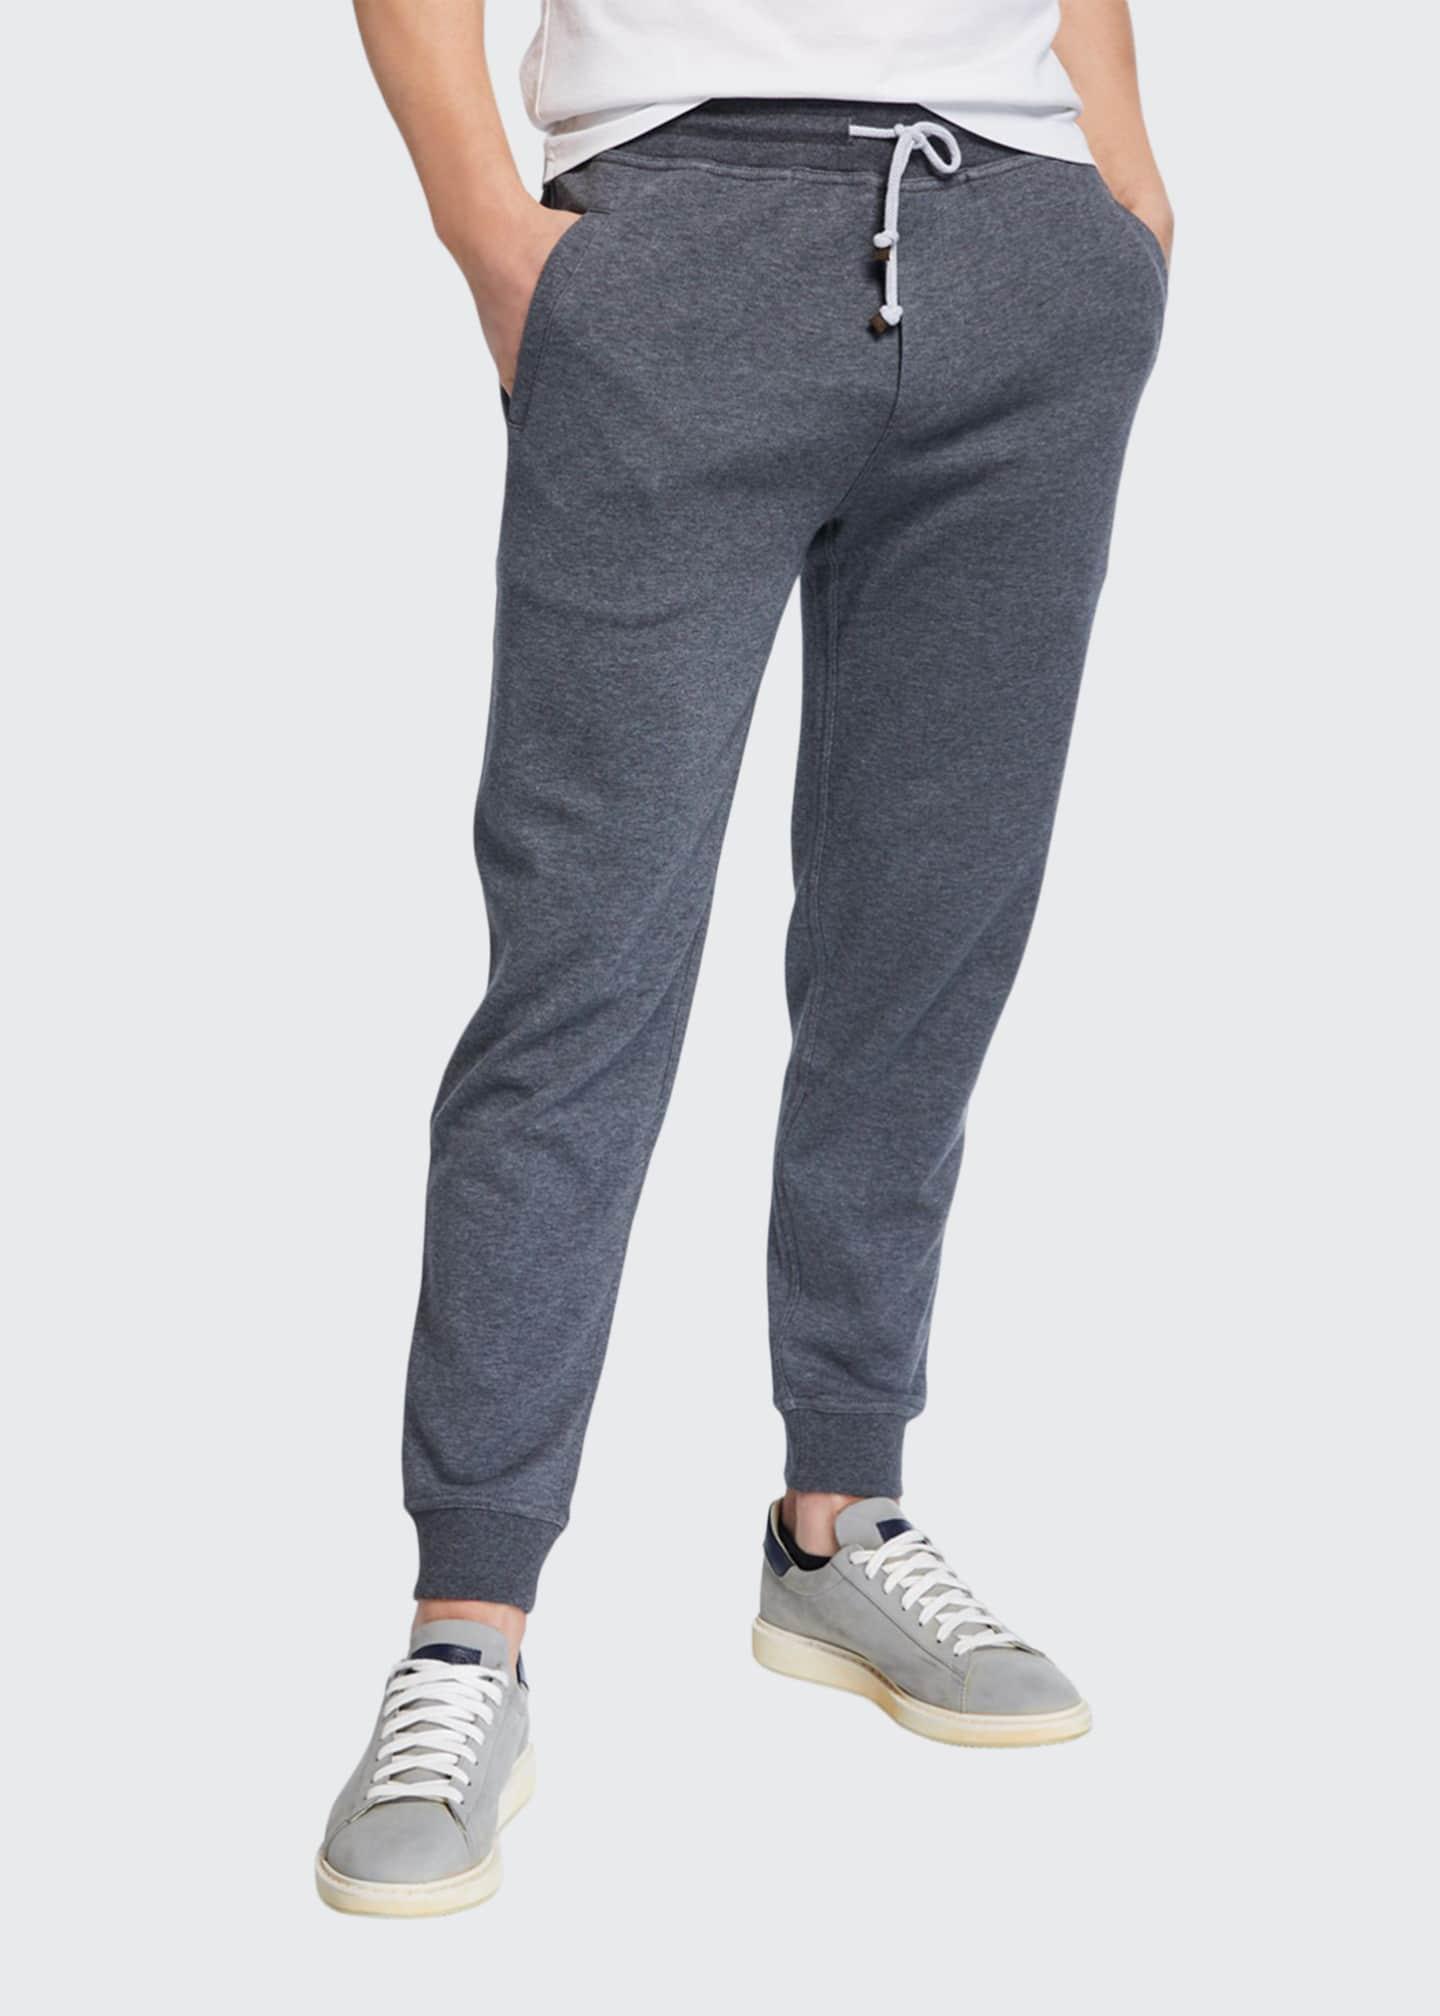 Brunello Cucinelli Men's Spa Heathered Sweatpants